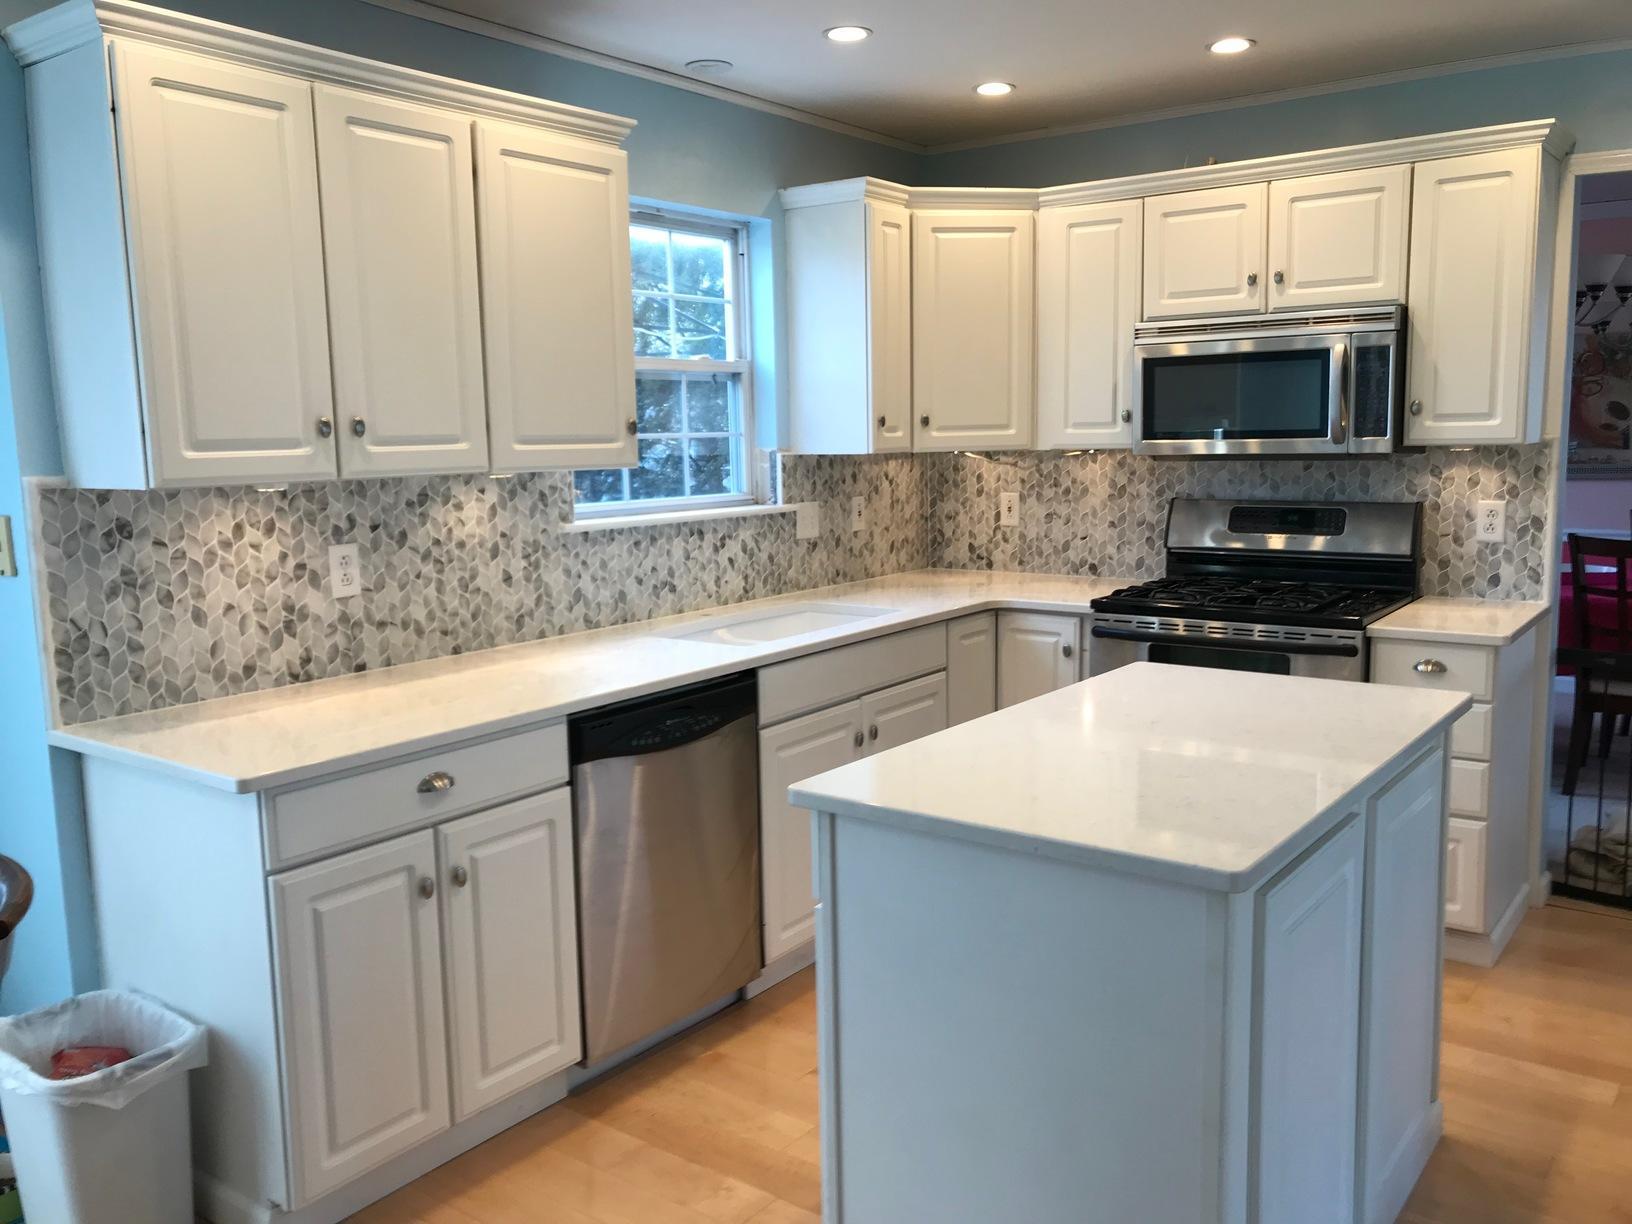 Scott C. - Kitchen Remodel, Cranberry Twp, PA